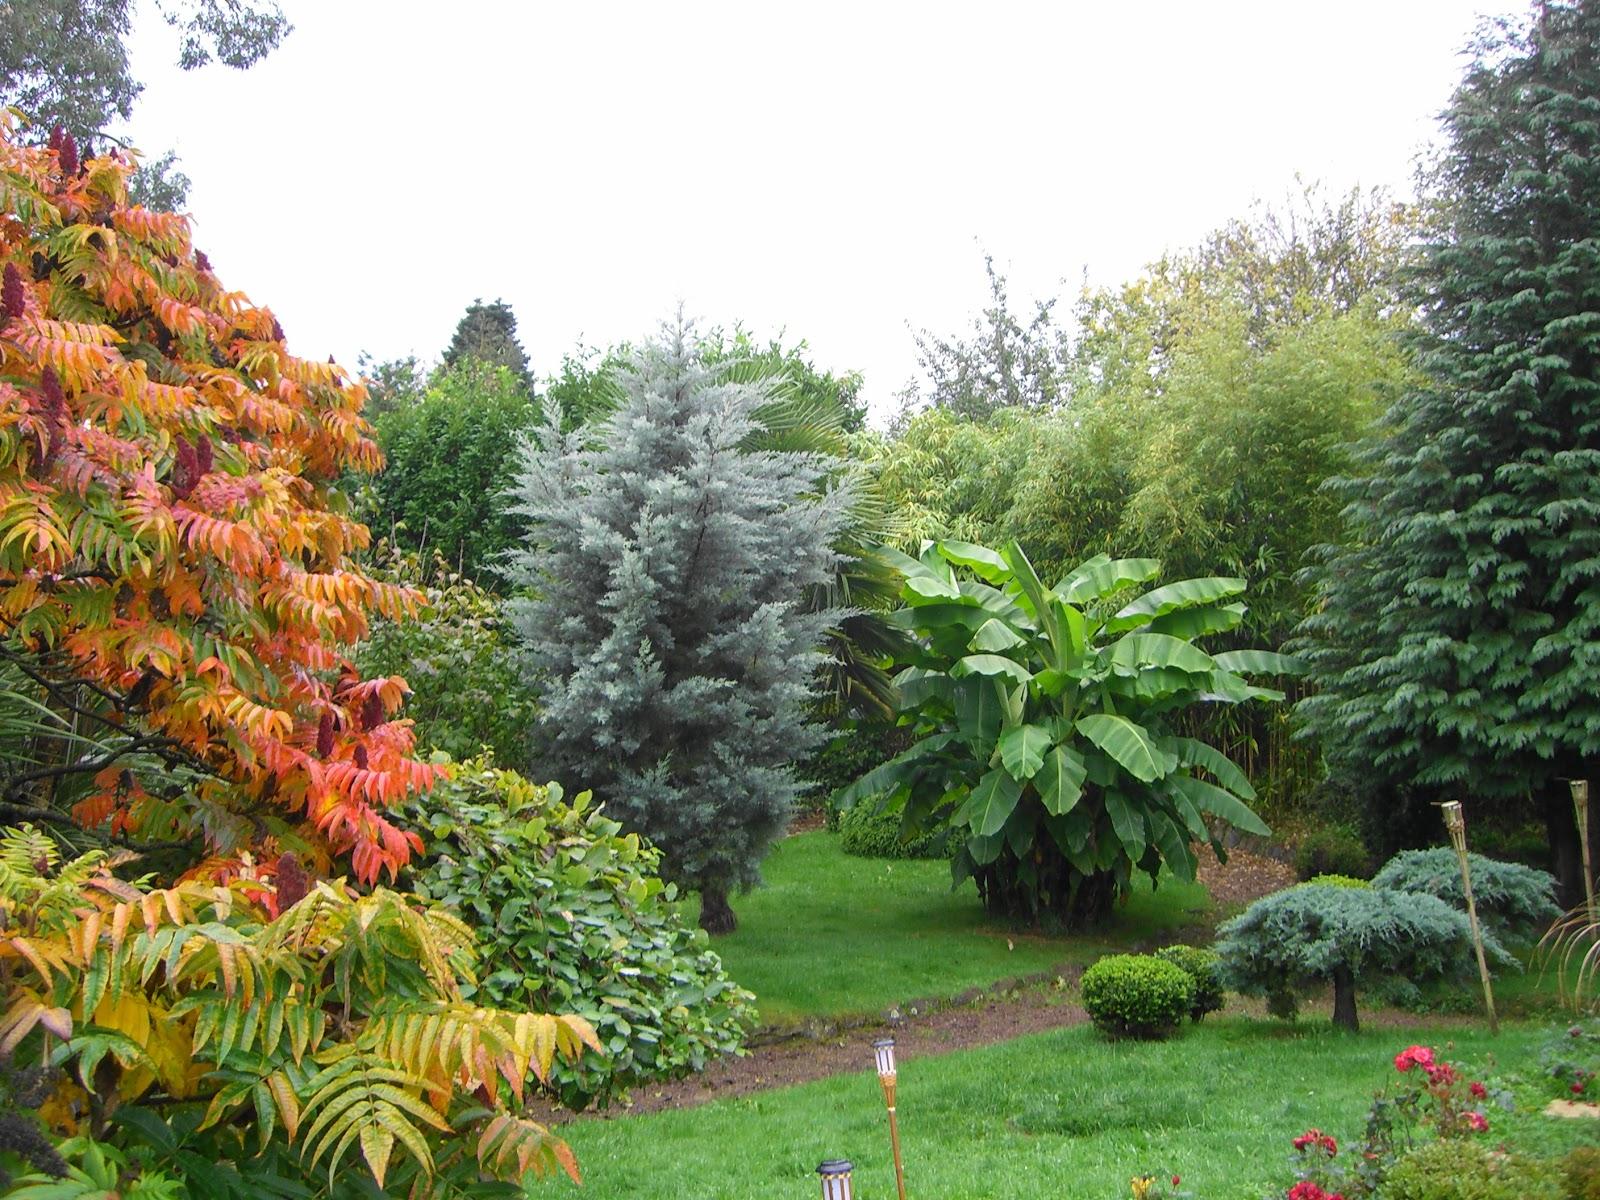 Sakujade jardin normand couleurs d 39 automne for Le jardin normand